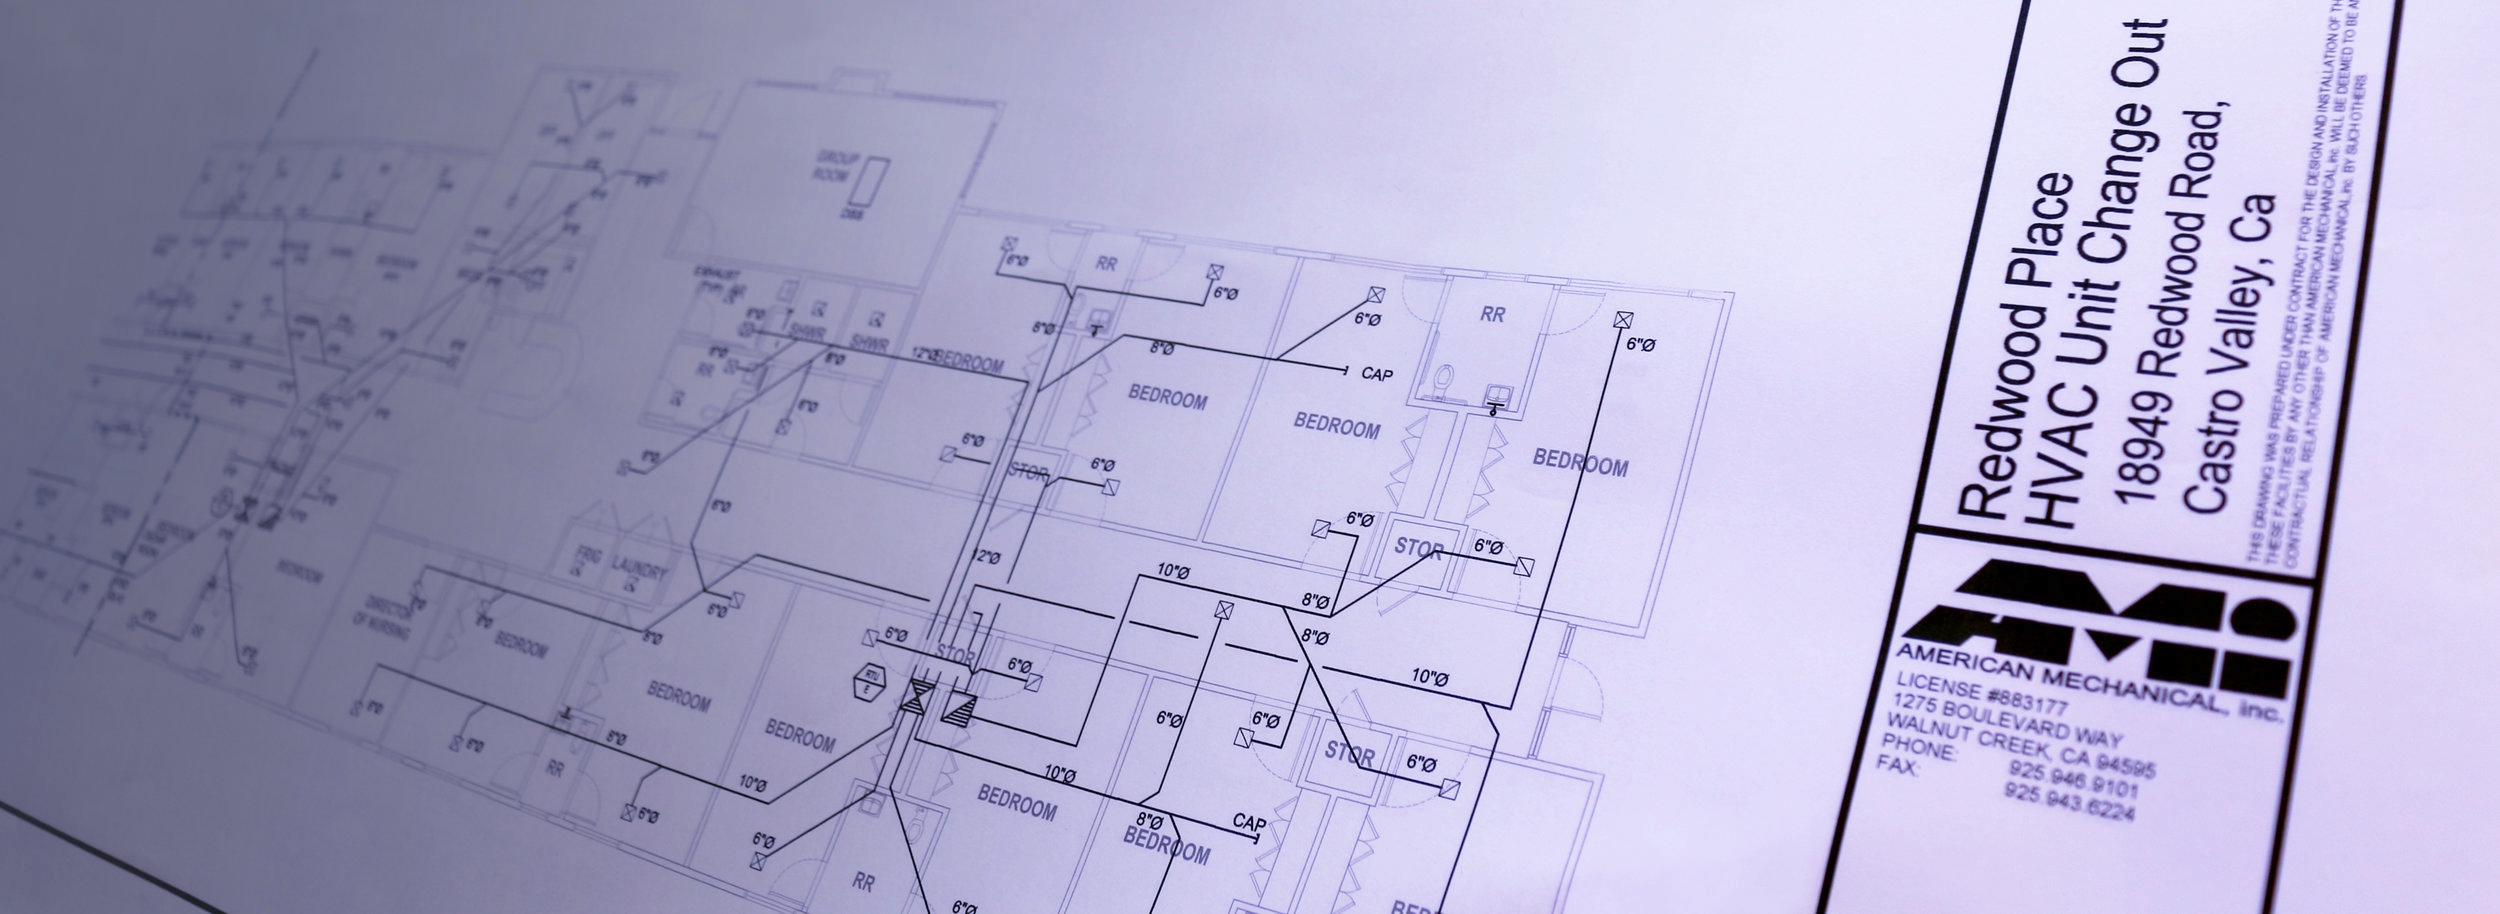 blueprint 3 jpg format 2500w [ 2500 x 914 Pixel ]